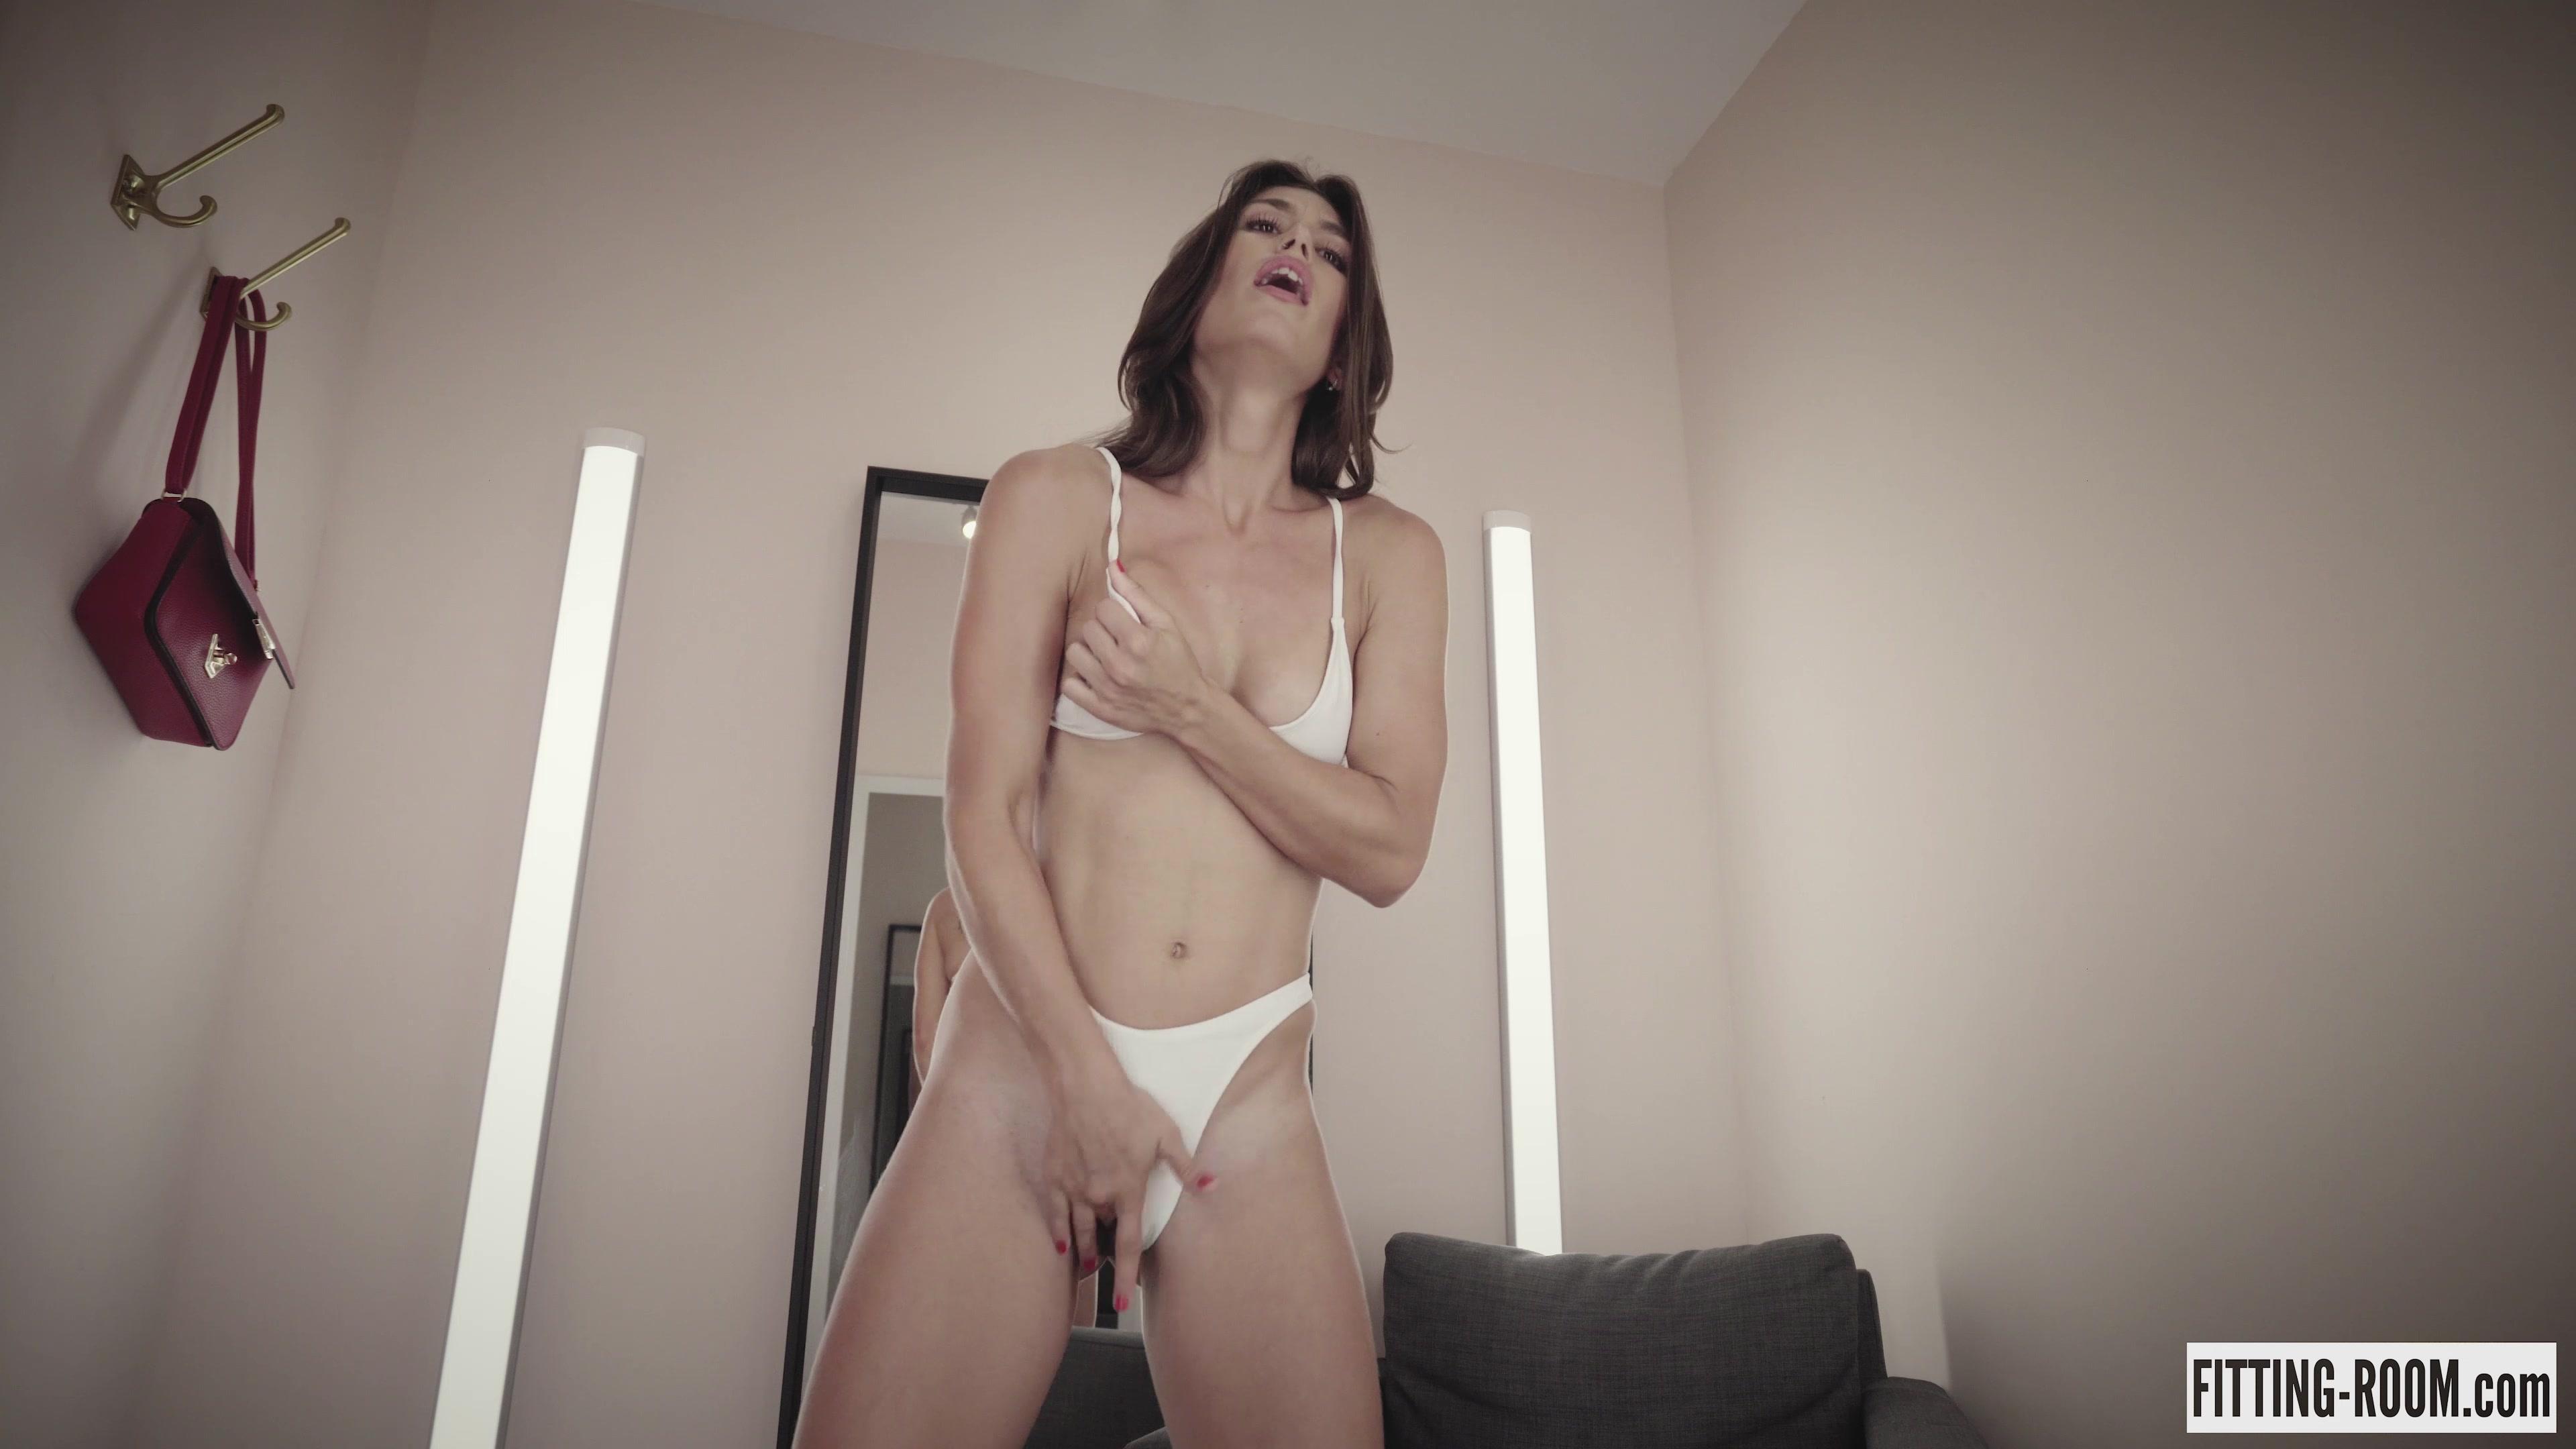 Julia Roca | Big Butt & White Micro Bikini